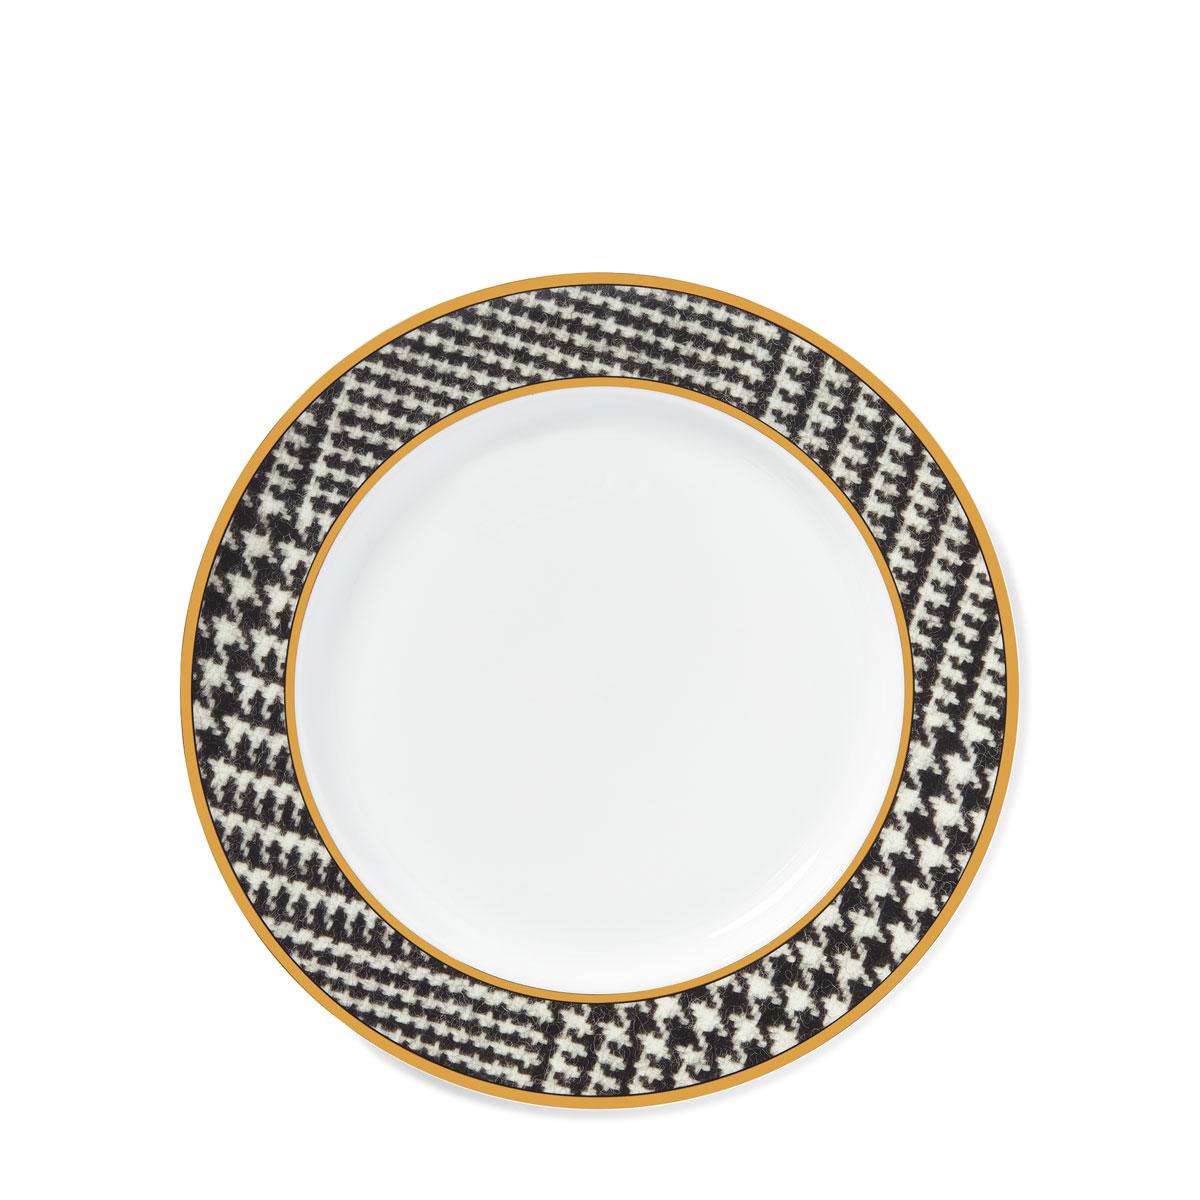 Ralph Lauren China Wessex Dinner Plate, Single